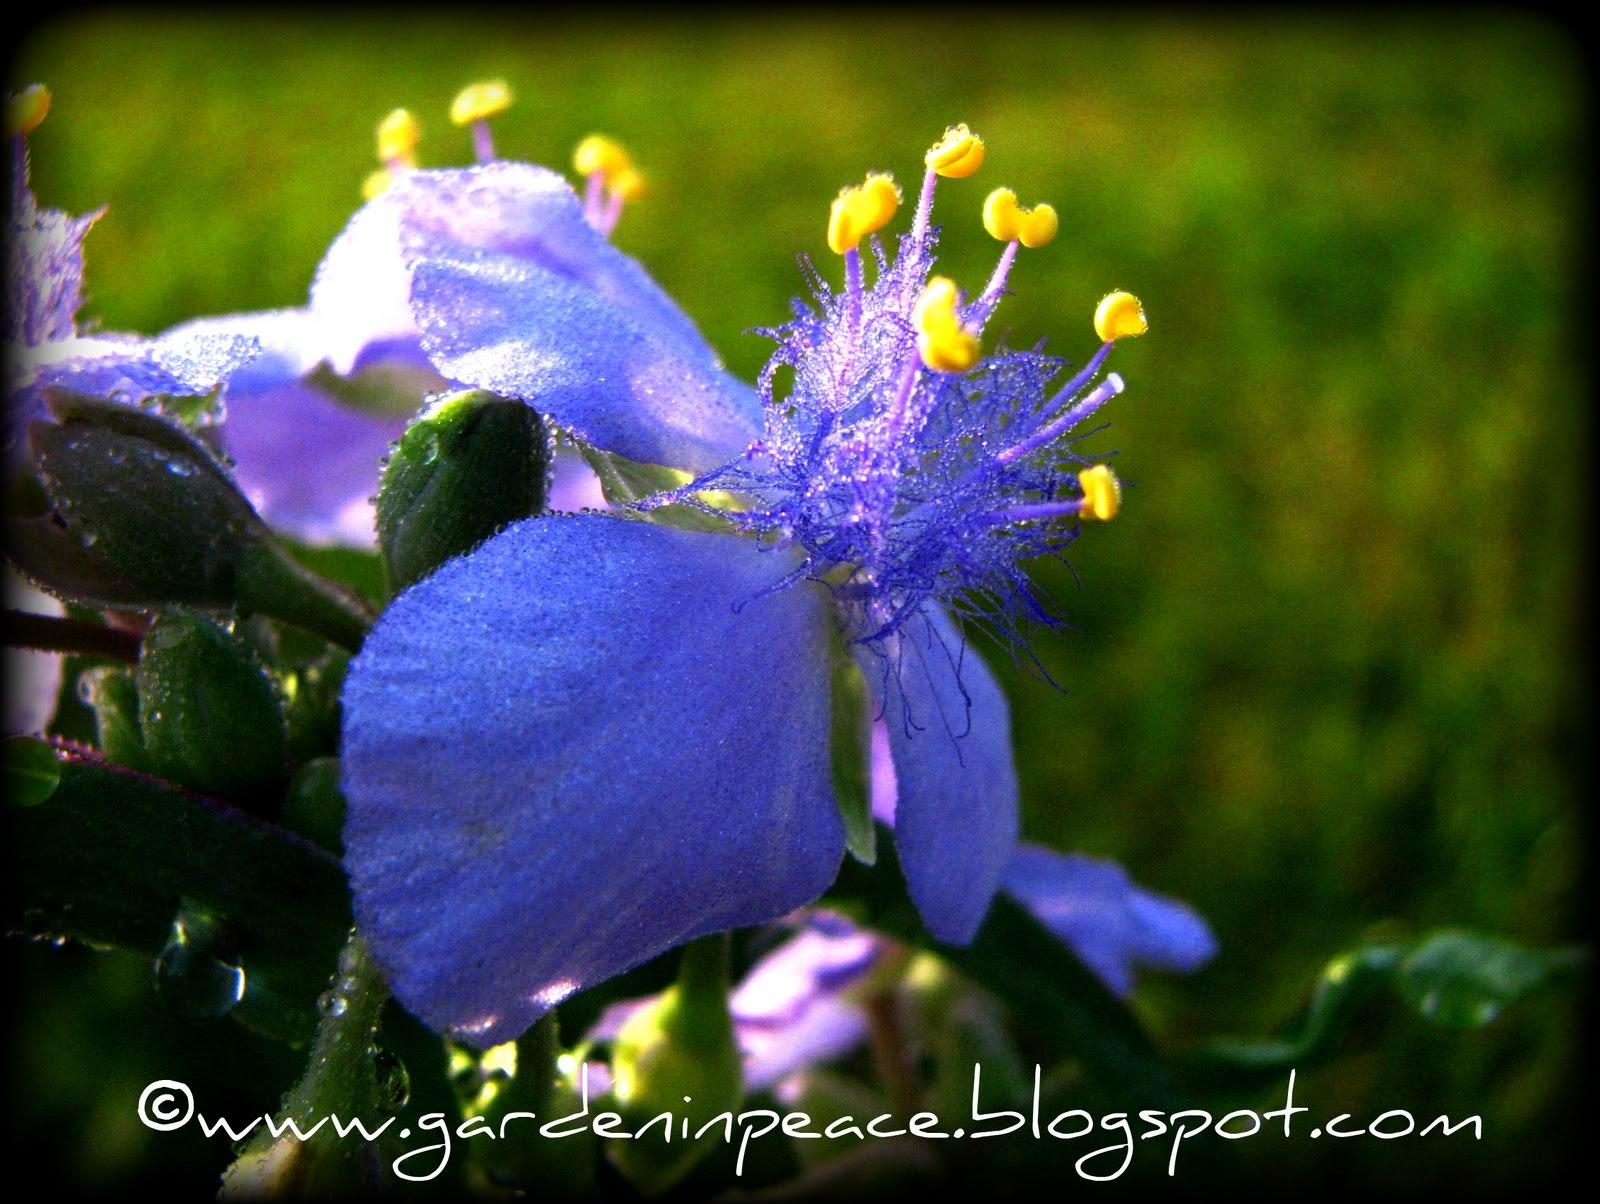 planting-spiderwort-blue-stone-roots html in ysazyxu github